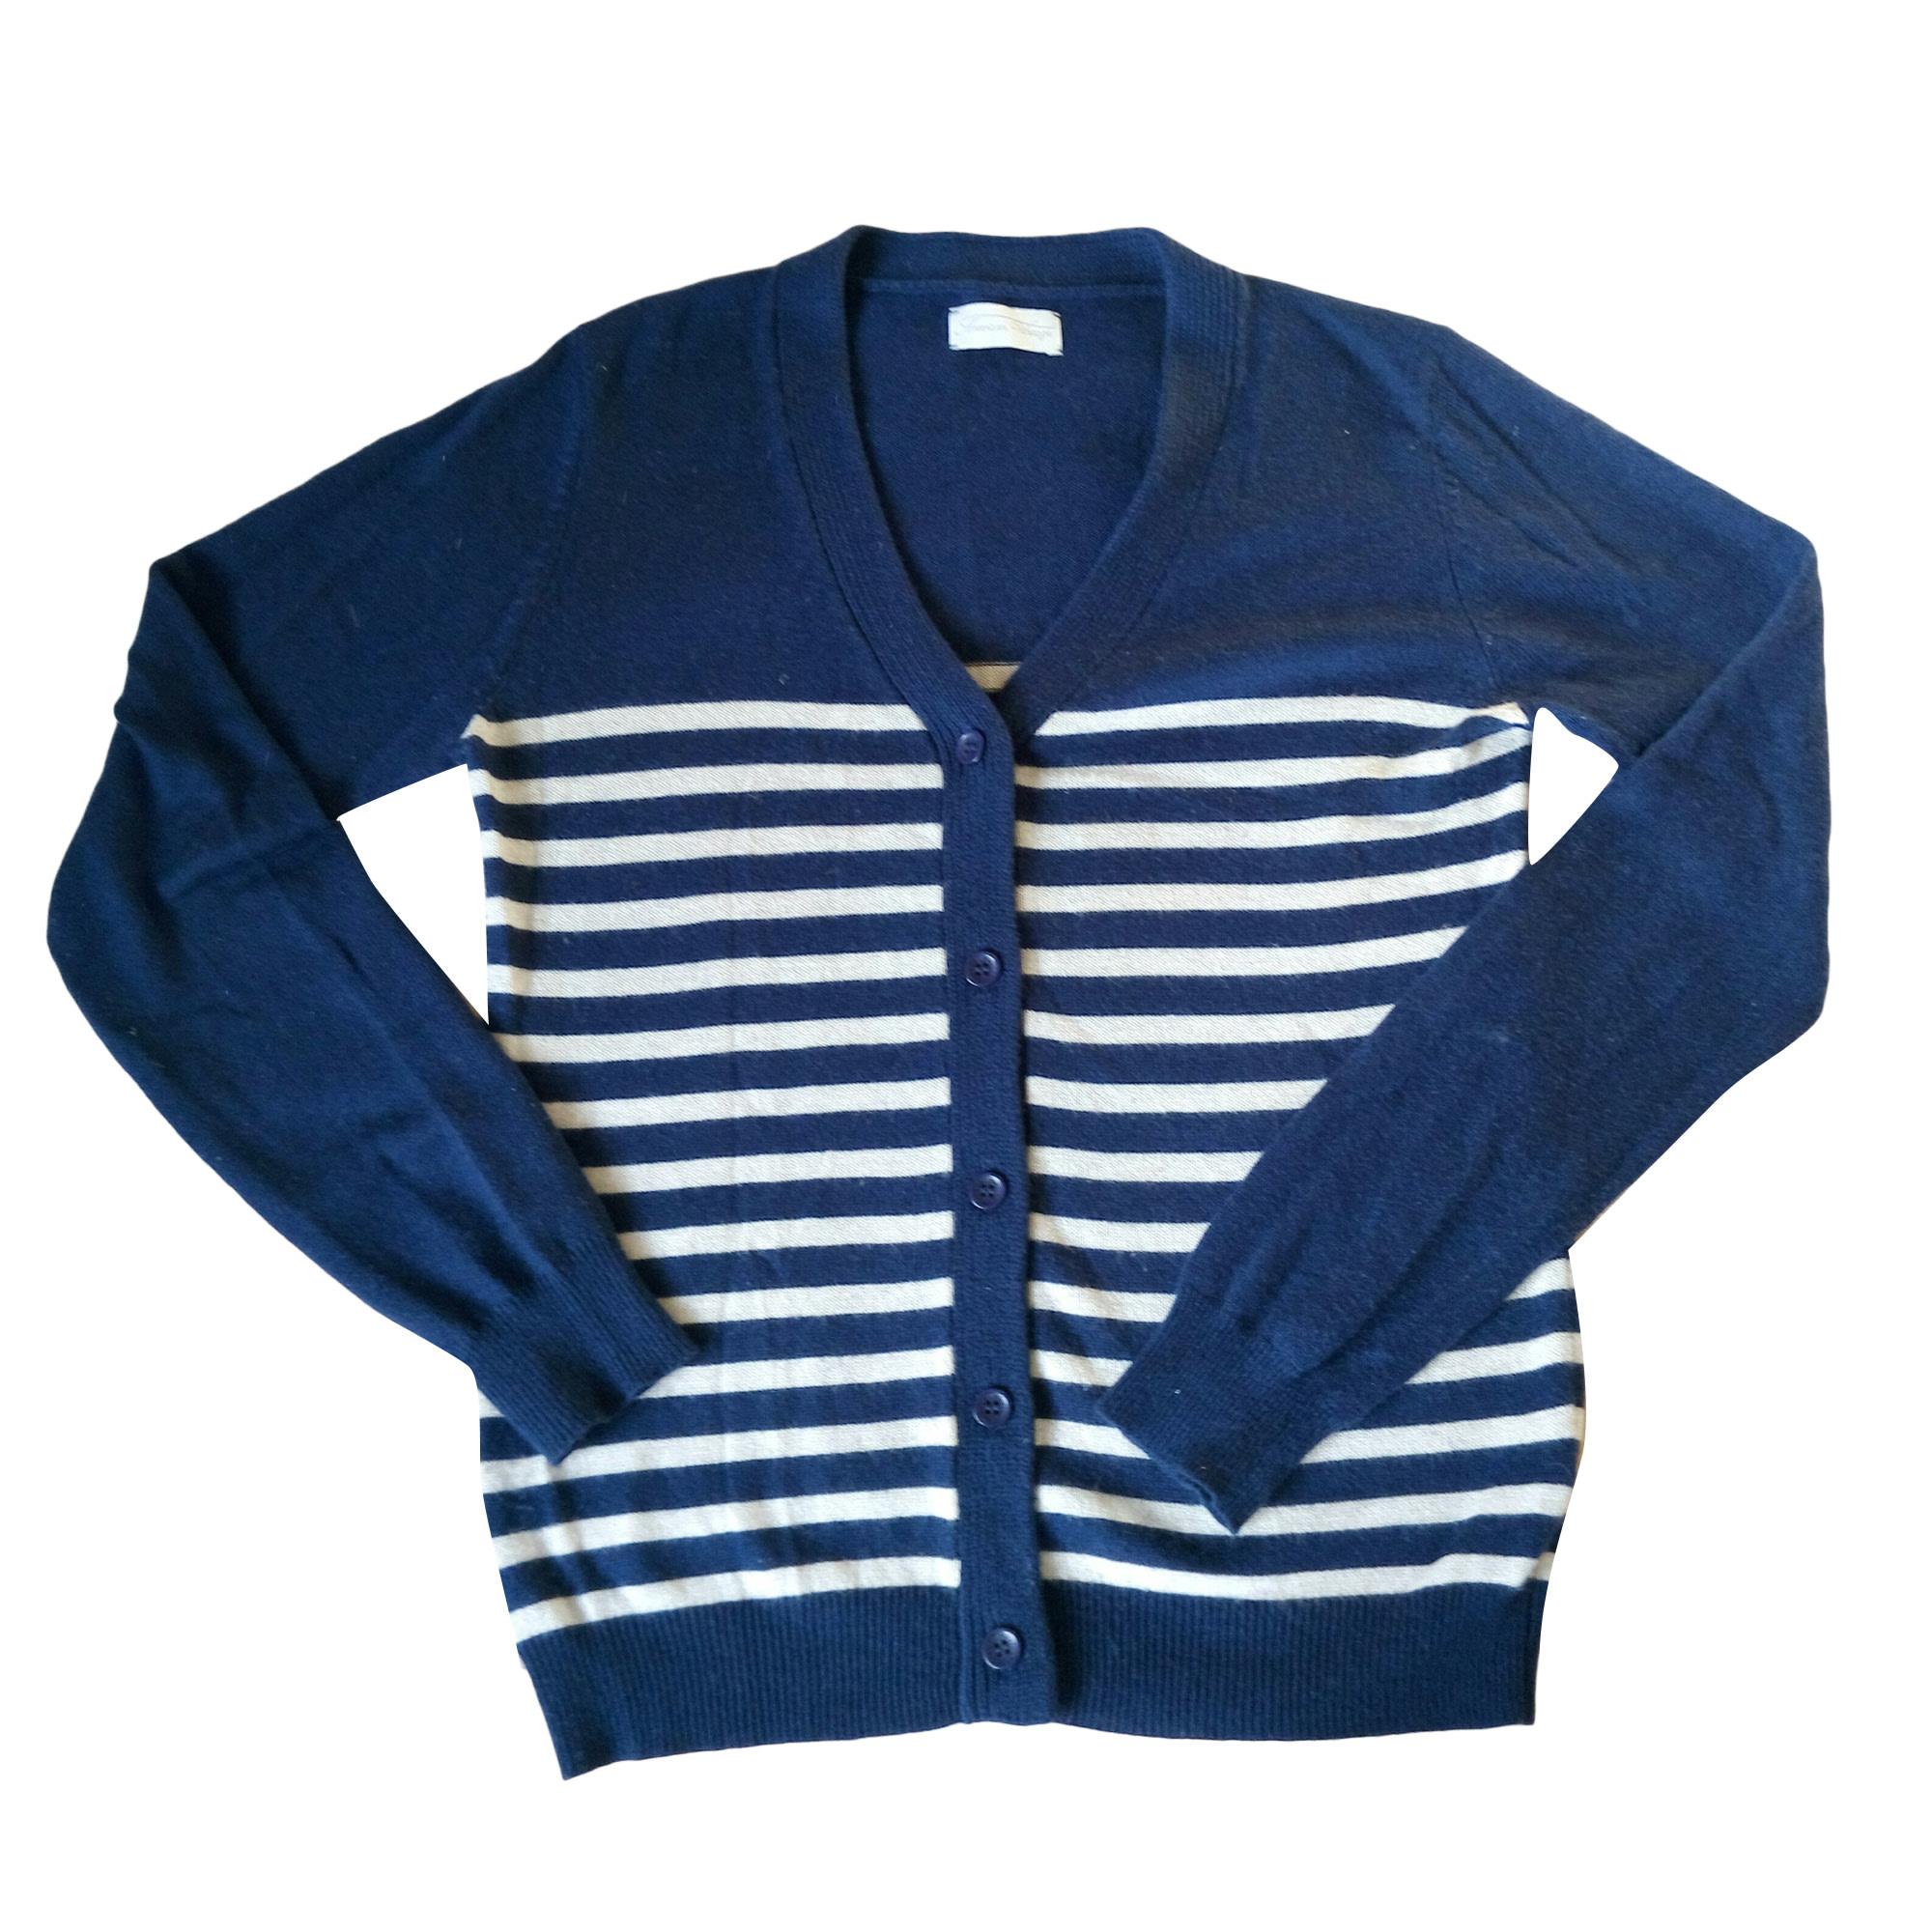 Gilet, cardigan AMERICAN VINTAGE Bleu, bleu marine, bleu turquoise